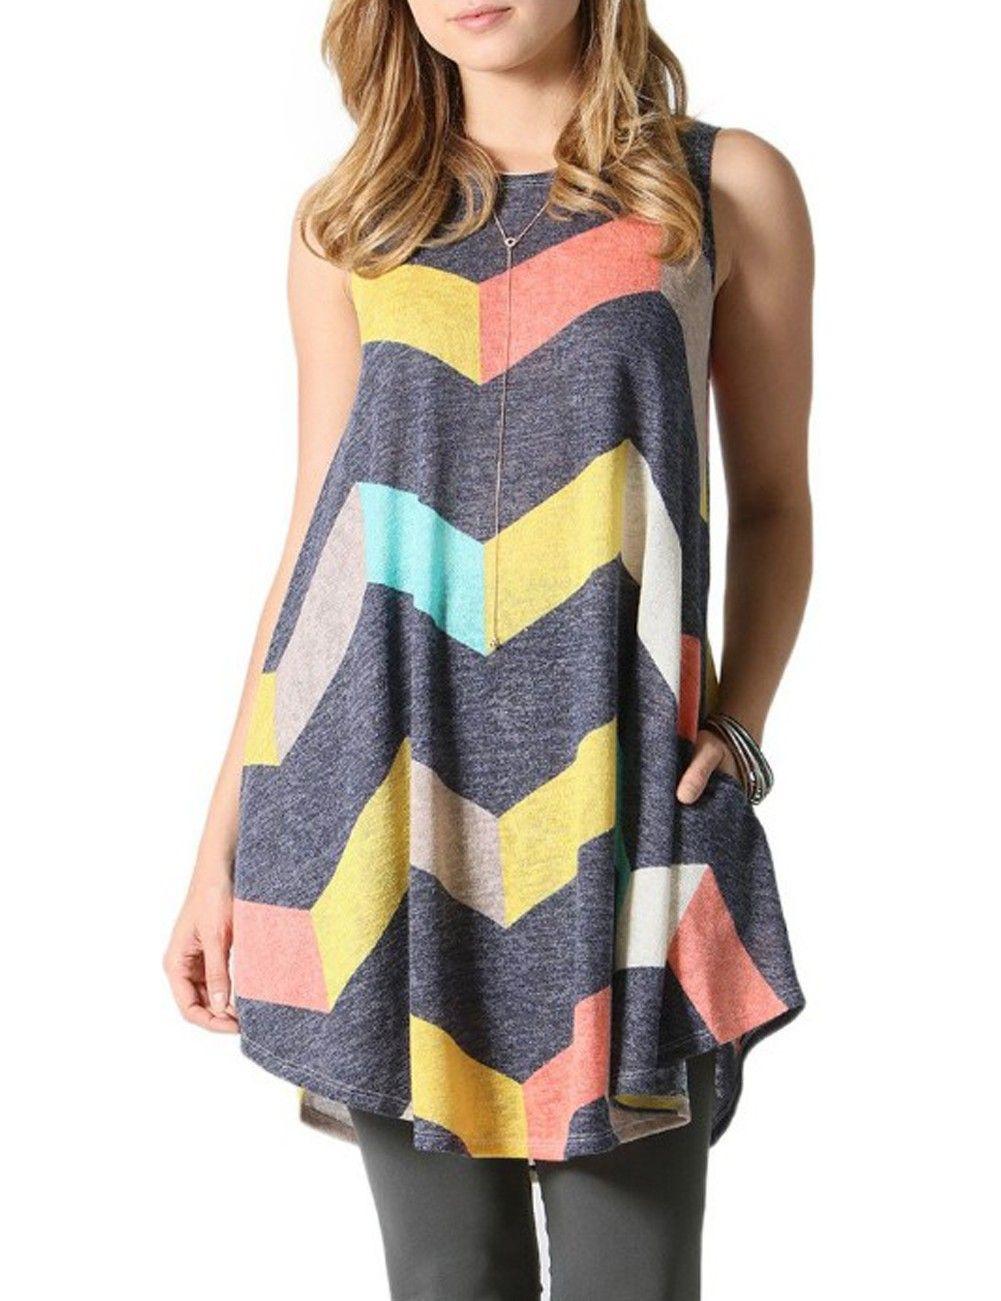 cf5ec35ef5ff0 Classical Grey Sleeveless Print Shirts Floaty Trim Chic Online ...